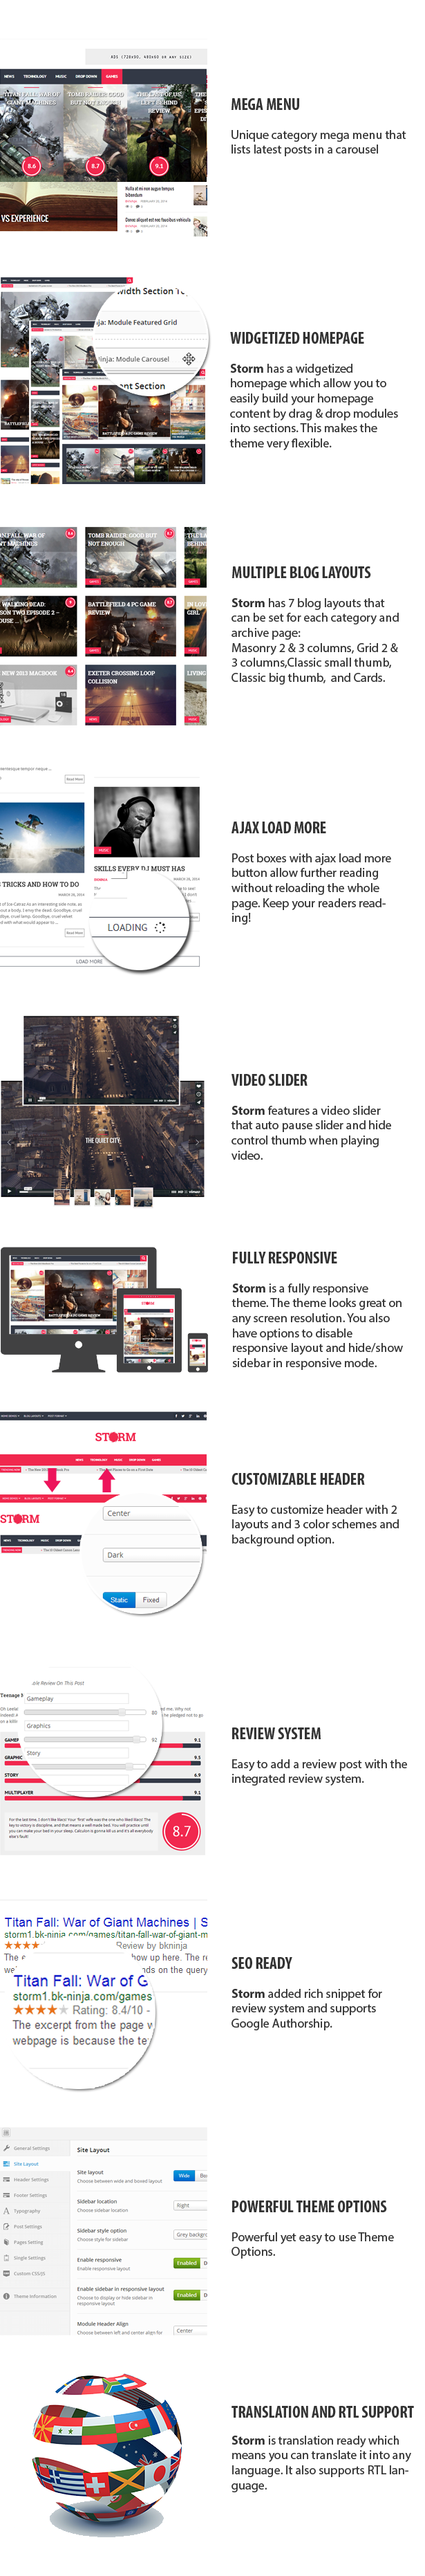 Storm - Clean Magazine & Blog Theme - 2